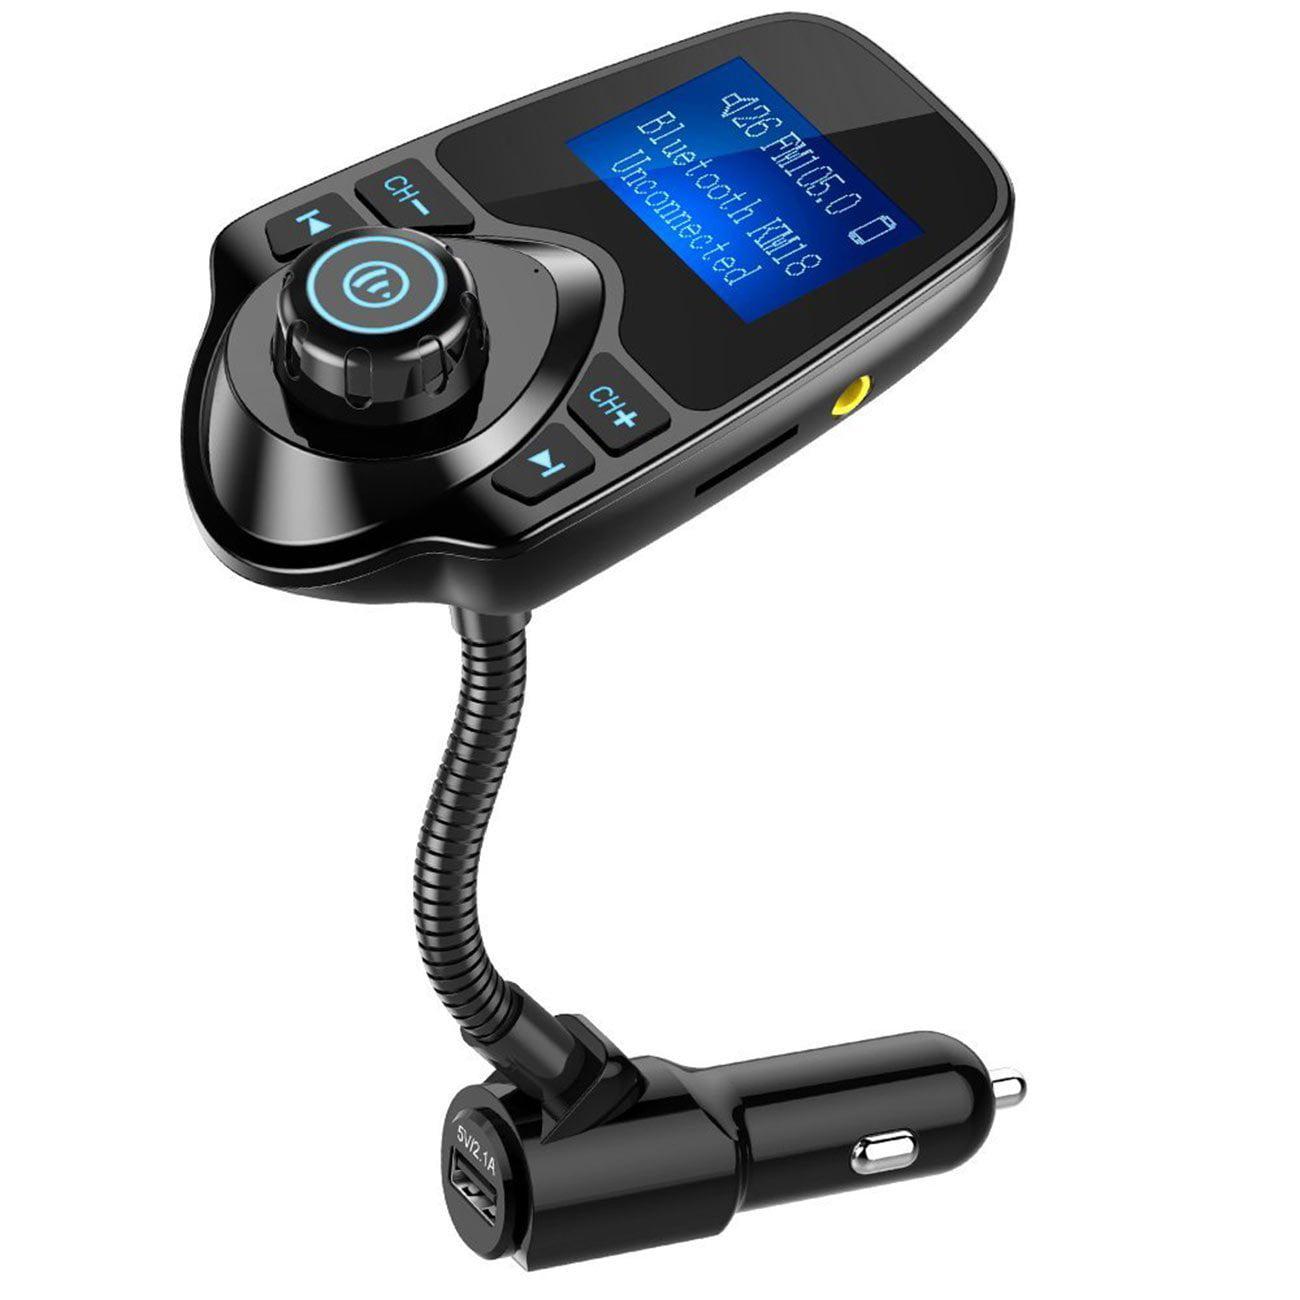 Nulaxy Bluetooth Car FM Transmitter Audio Adapter Receiver Wireless Handsfree Car Kit W 1.44 Inch Display - KM18 Black